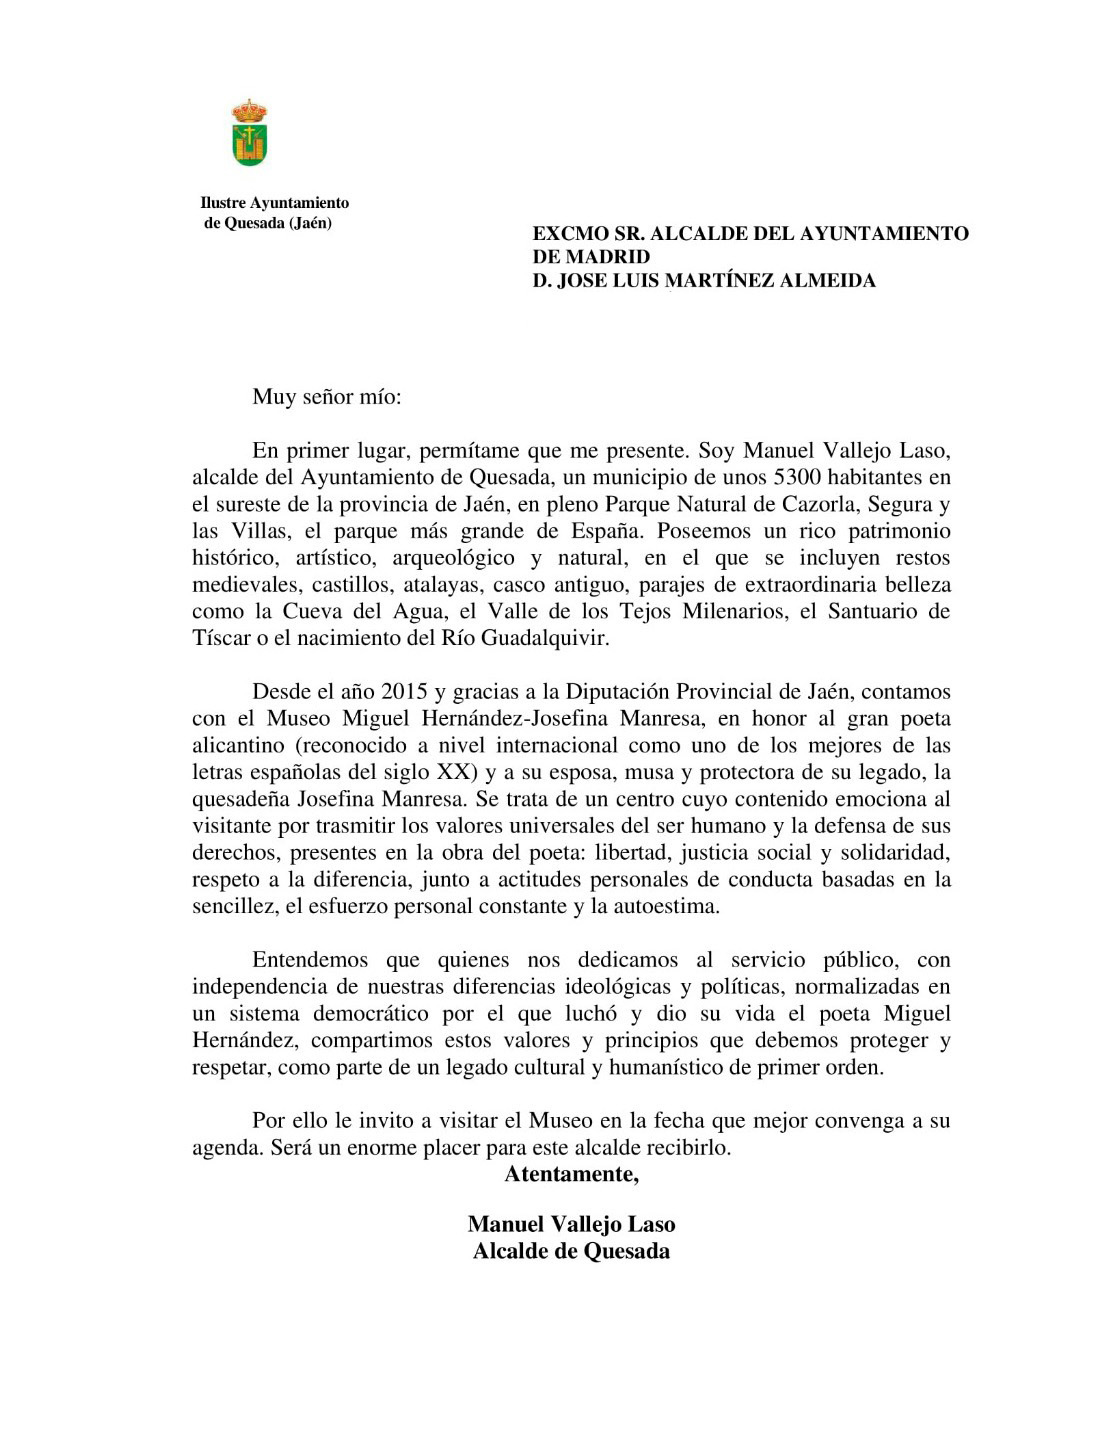 Carta del alcalde de Quesada al alcalde de Madrid sobre Miguel Hernández